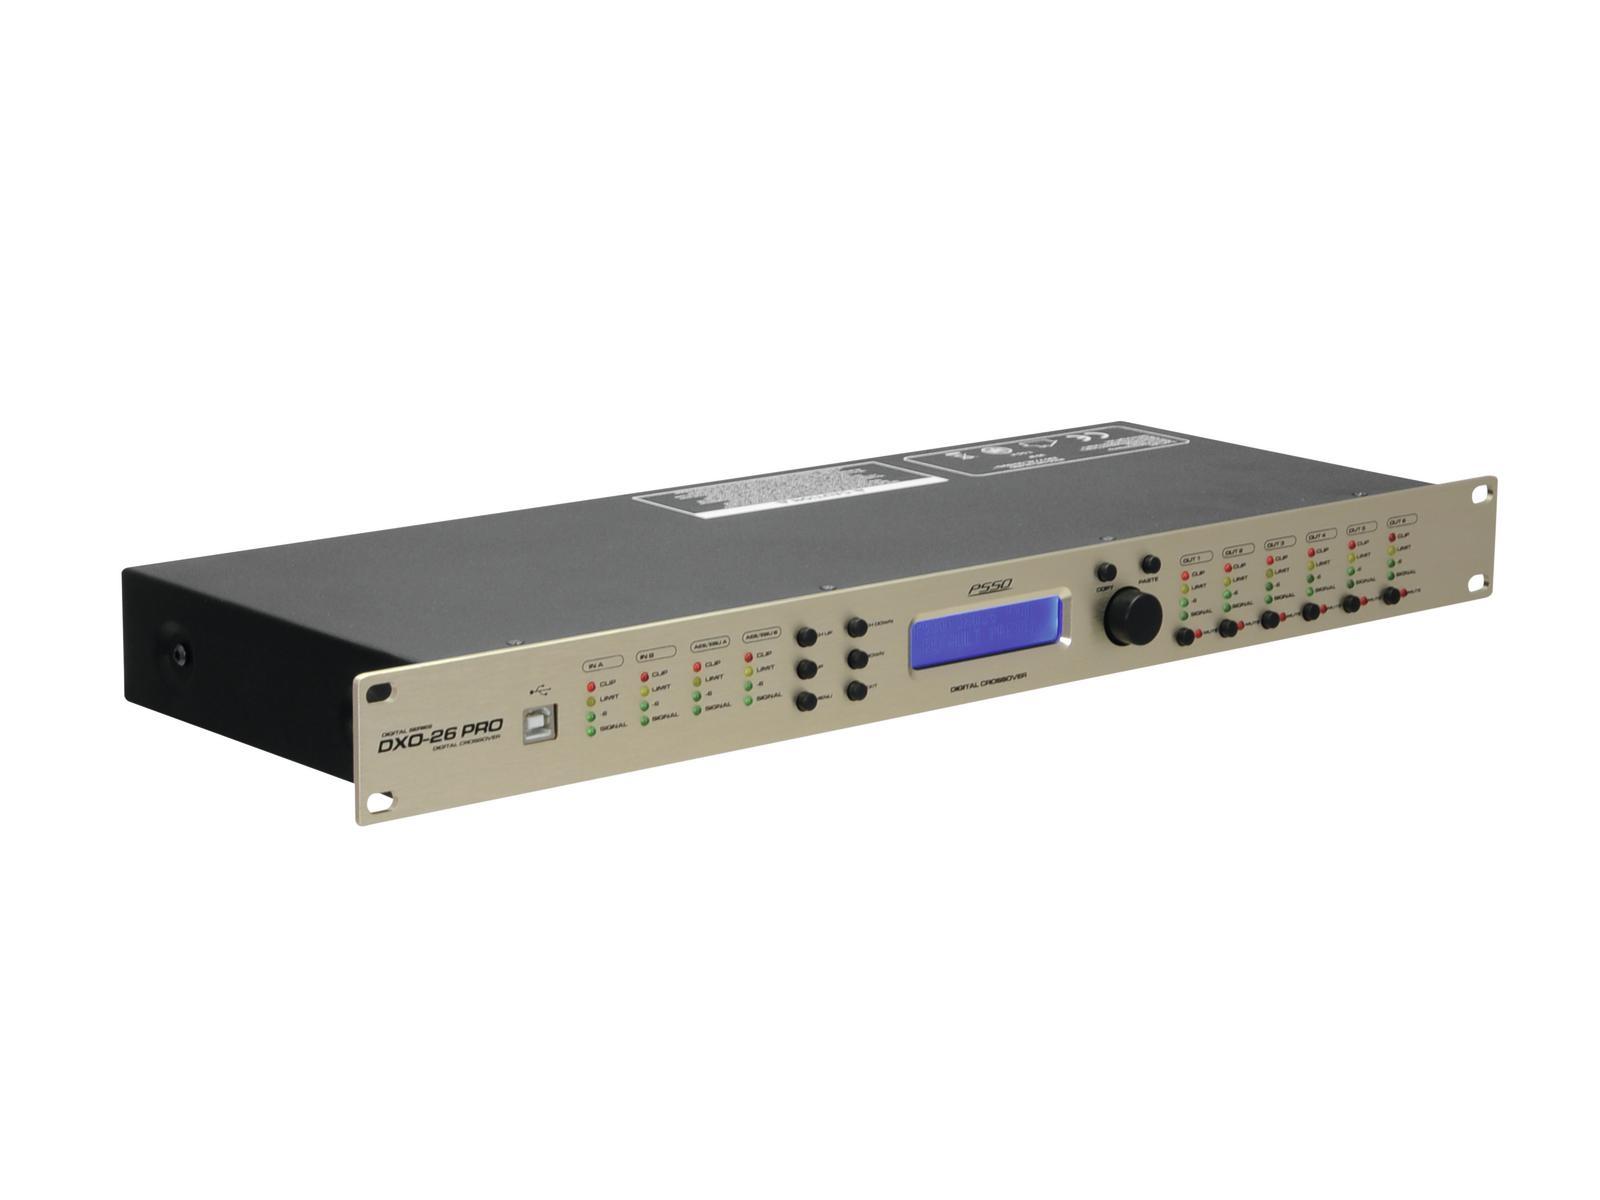 PSSO DXO-26 PRO Digitaler Controller